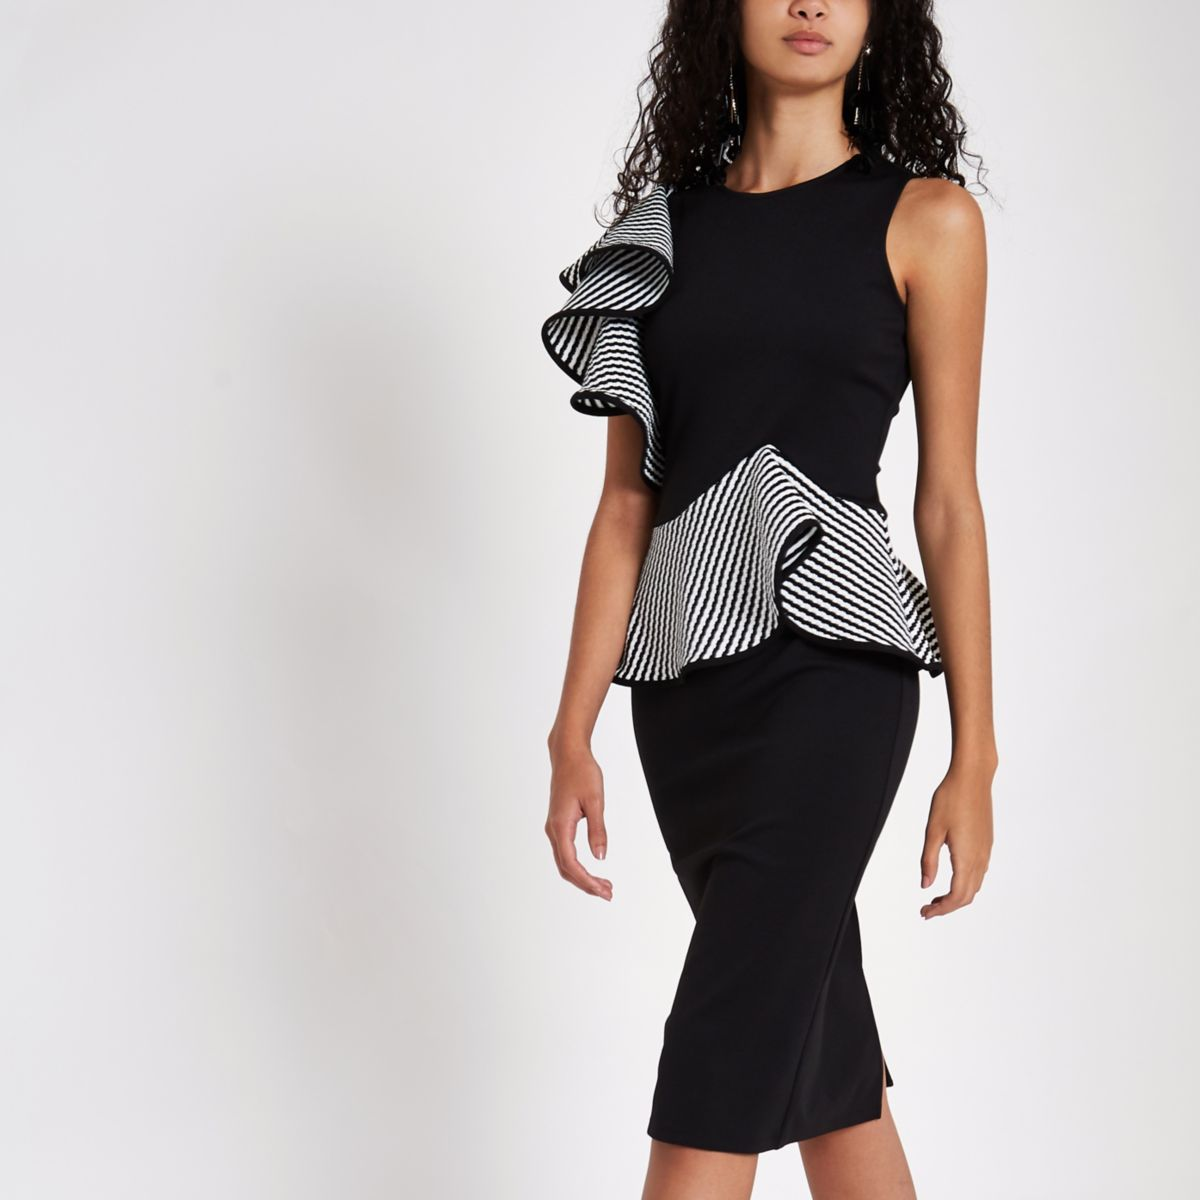 Black frill detail bodycon dress